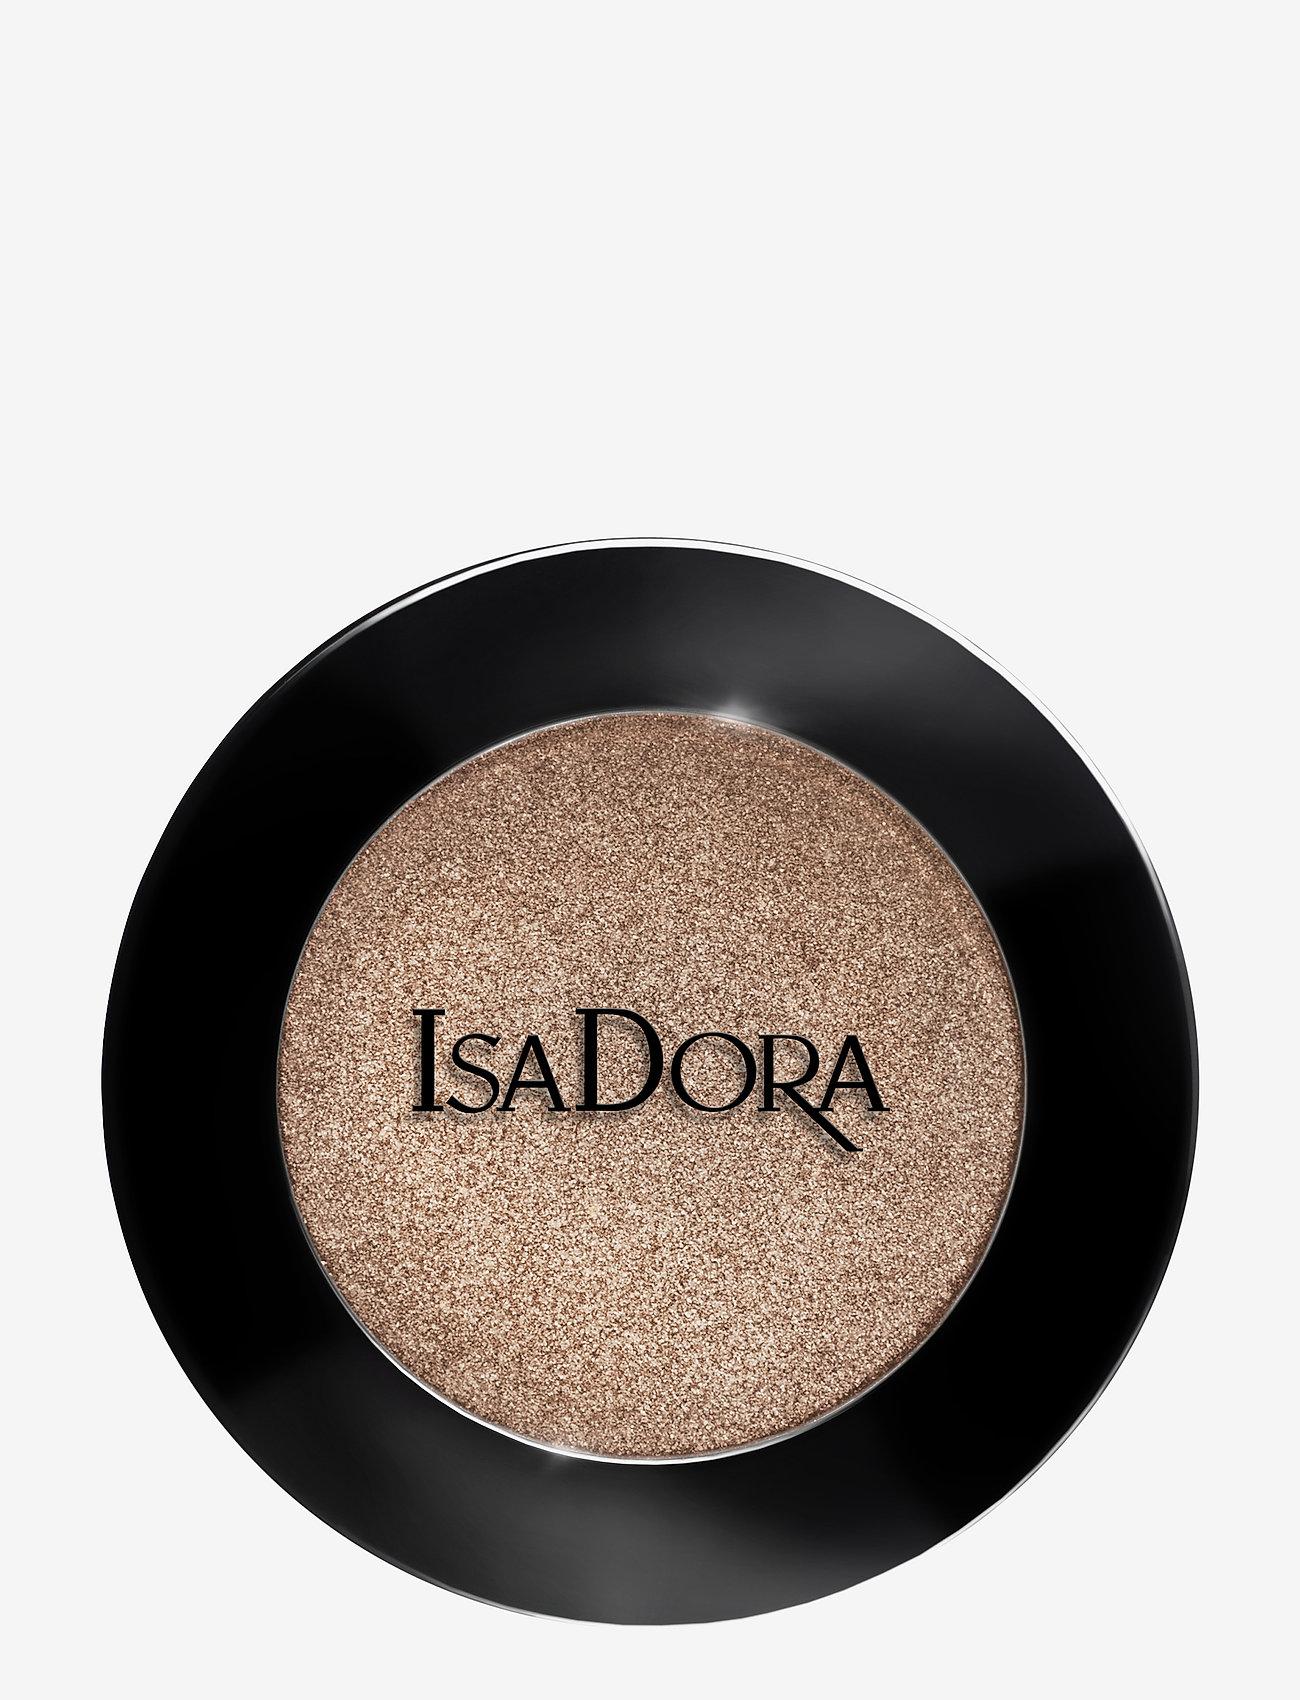 Isadora - PERFECT EYES 36 GOLDEN GLOW - Ögonskugga - 336 golden glow - 0